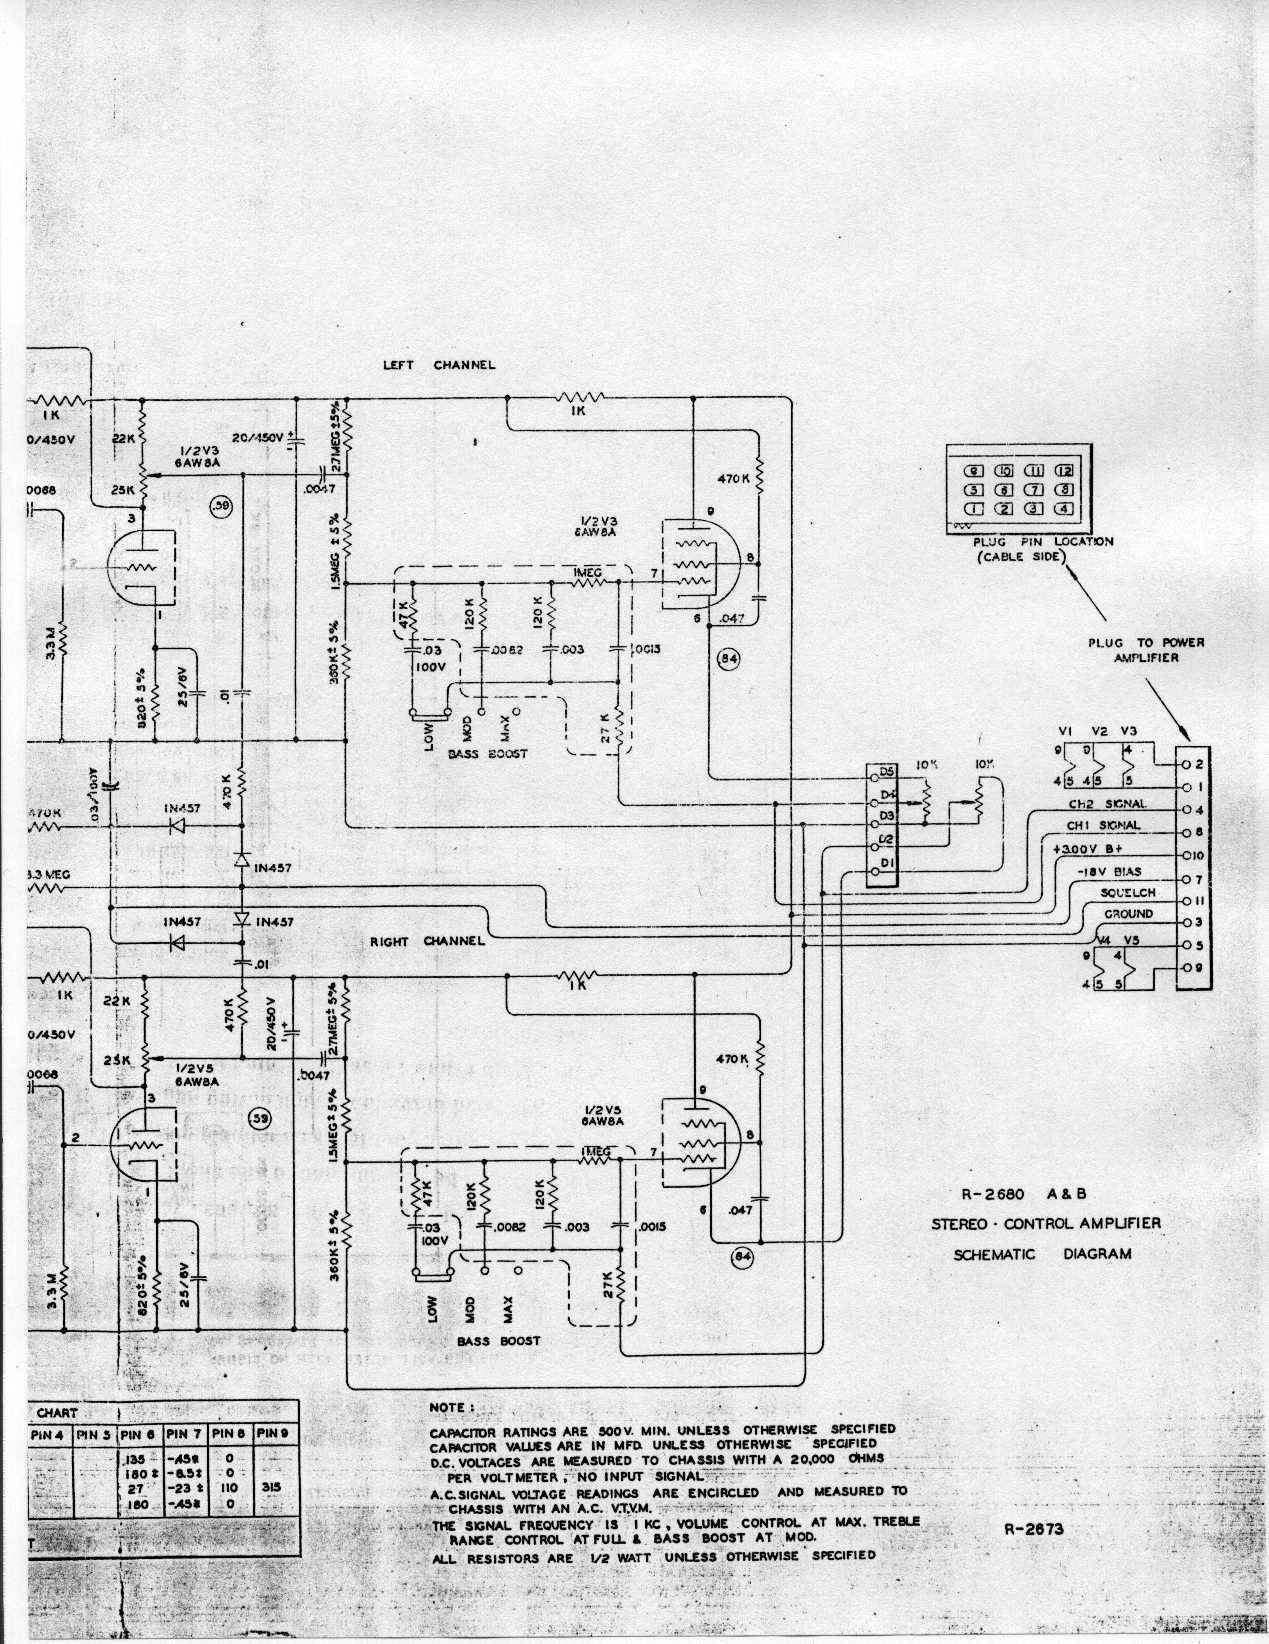 From Dangillitzer At Yahoocom Thu Jan 1 060134 2004 Rowe Ami Jukebox Electronic Circuit Board Repair All Models R80s To R Jbm 200a